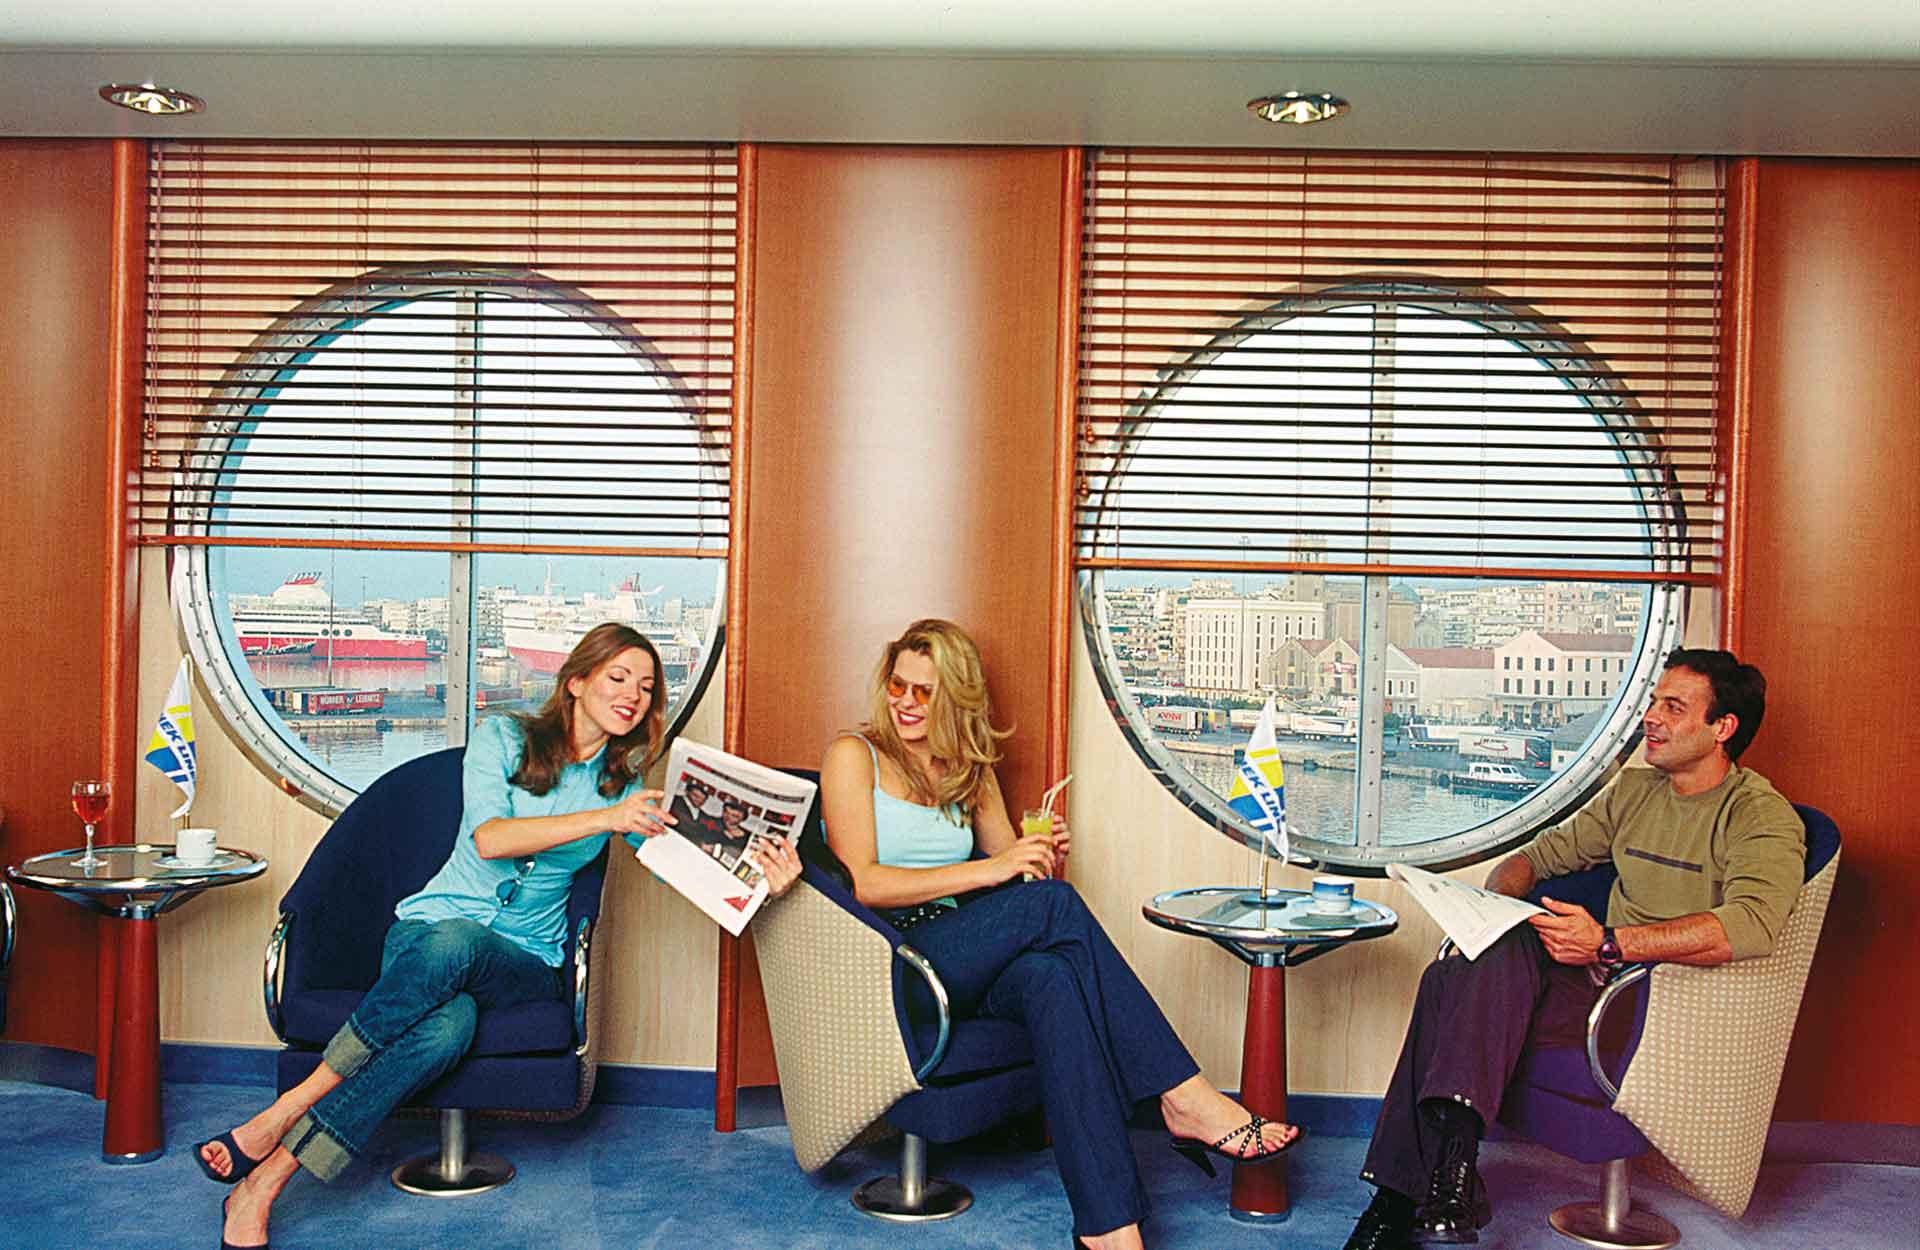 Sala attesa, Hellenic Spirit, Anek Traghetti Grecia